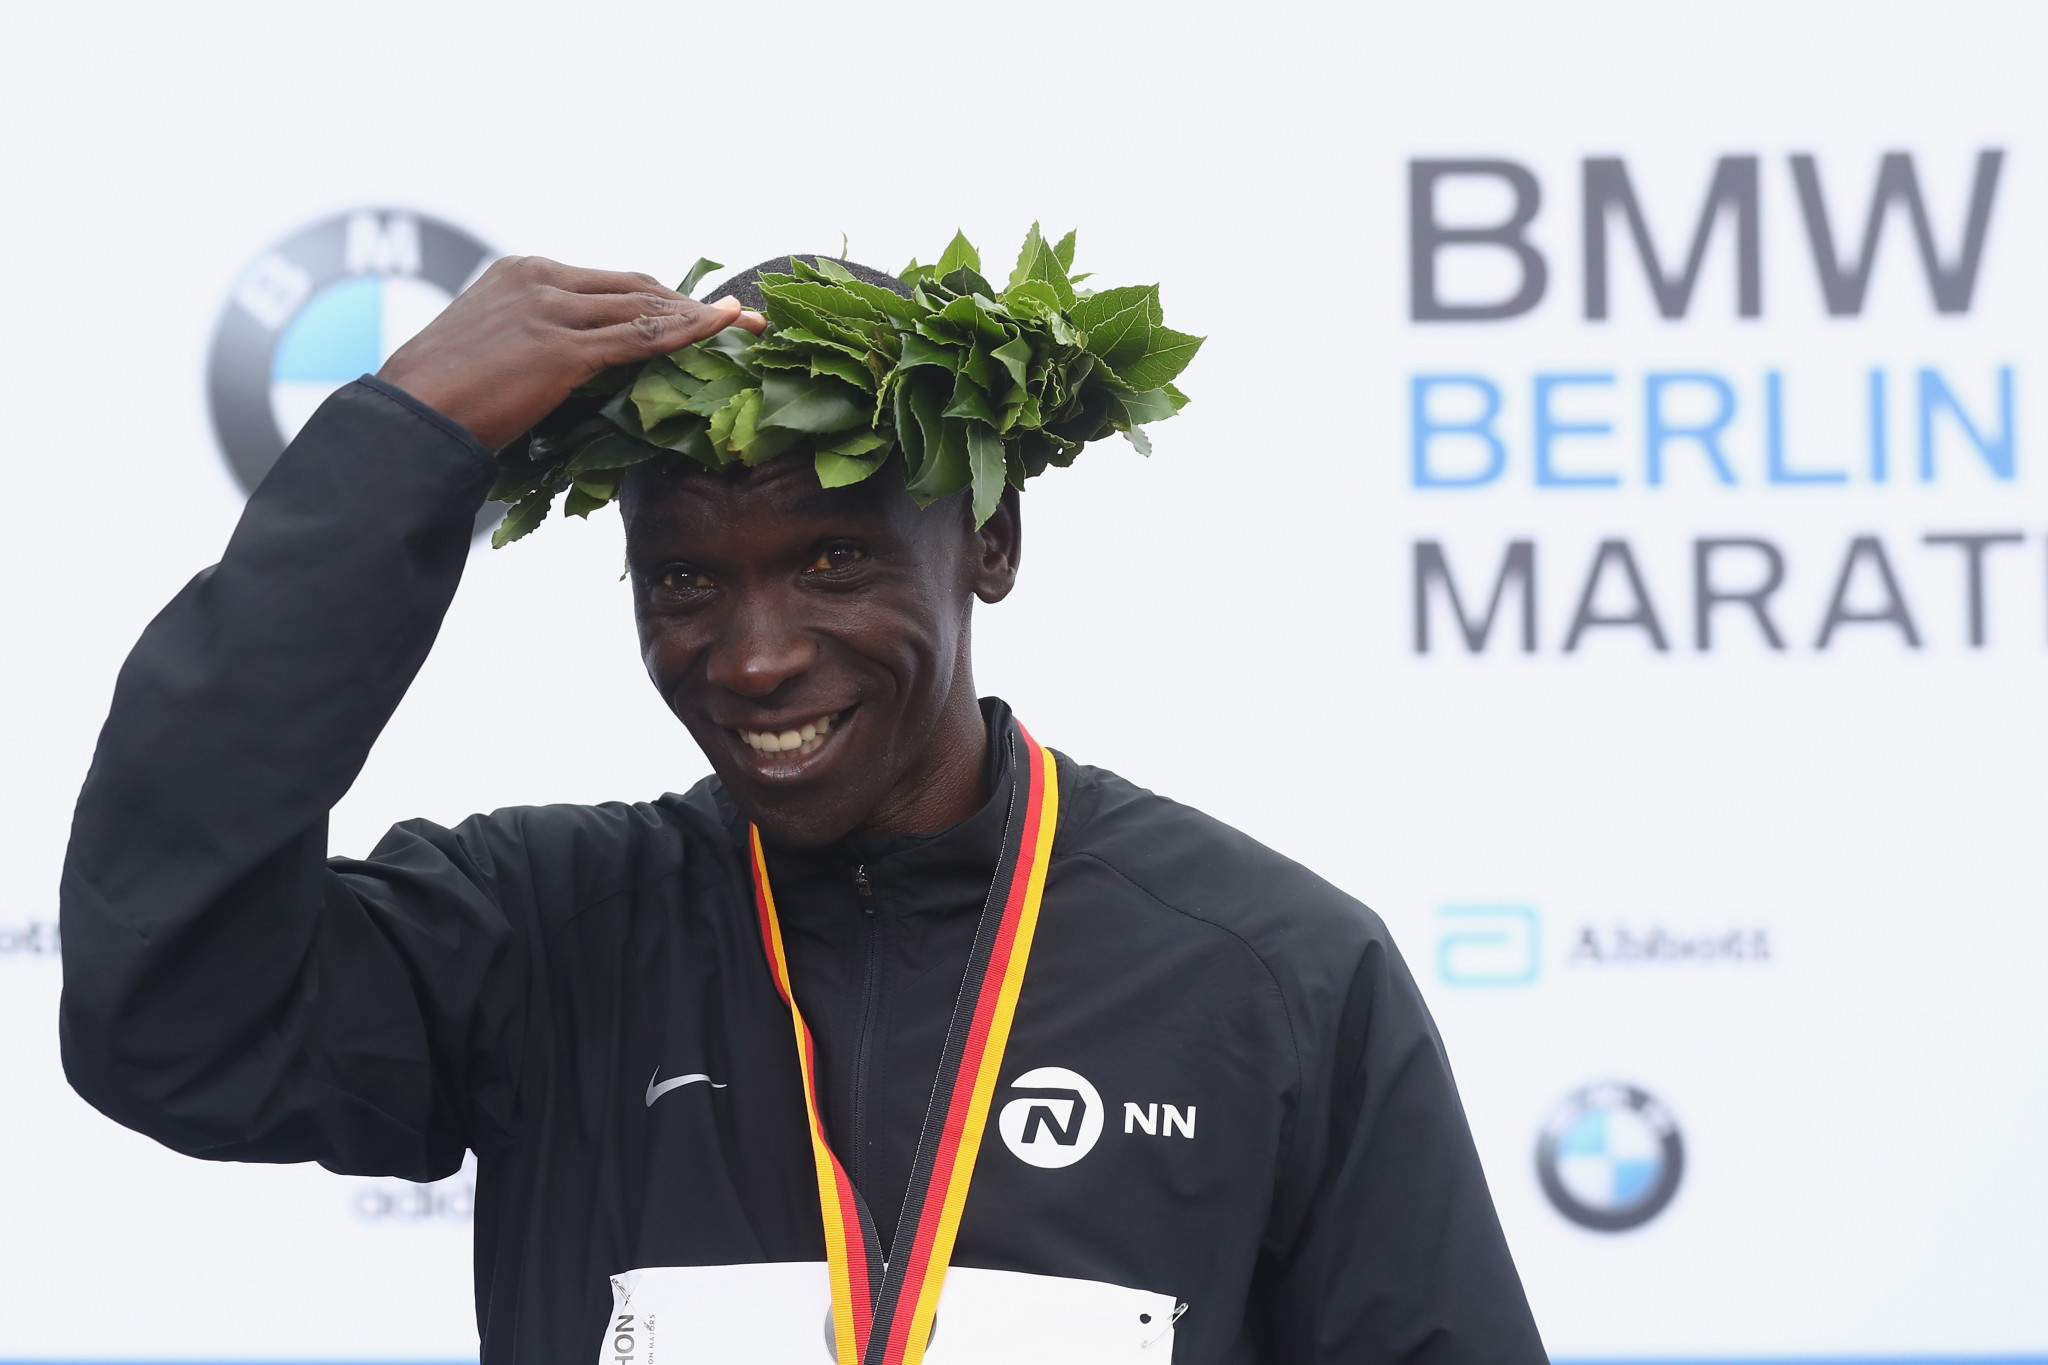 Eliud Kipchoge celebrates his Berlin Marathon win ©Getty Images